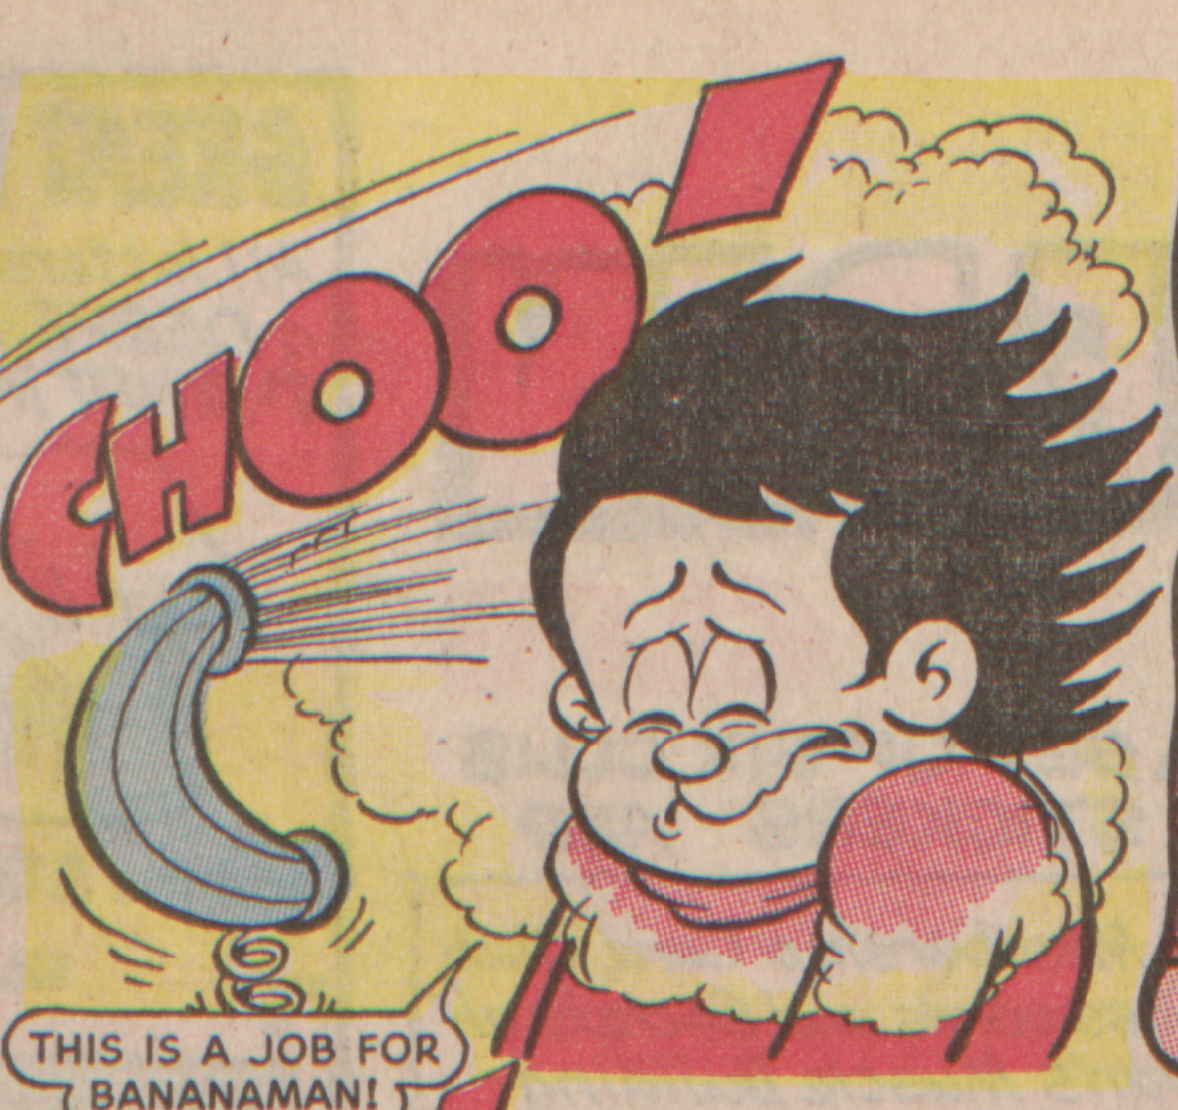 Bananaman 1985 - Sneeze epidemic